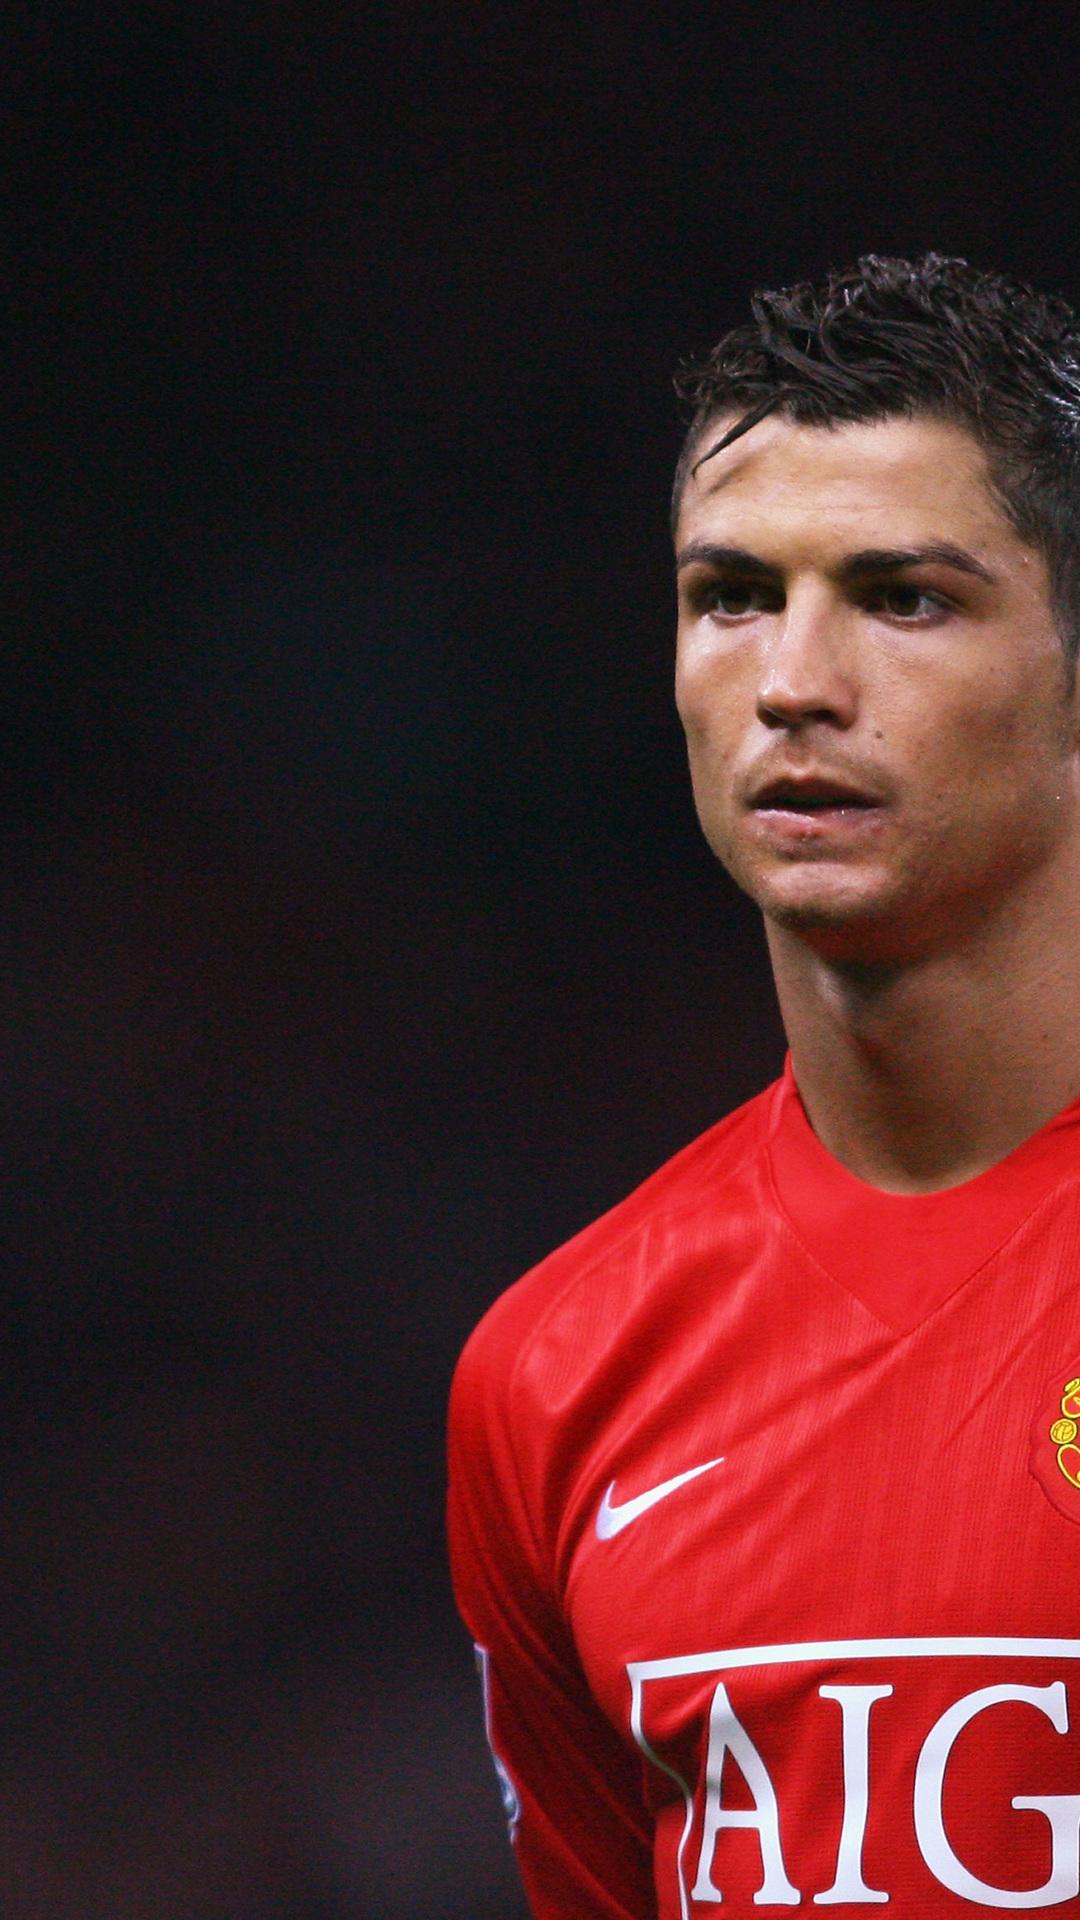 Cristiano Ronaldo Manchester United 2310858 Hd Wallpaper Backgrounds Download